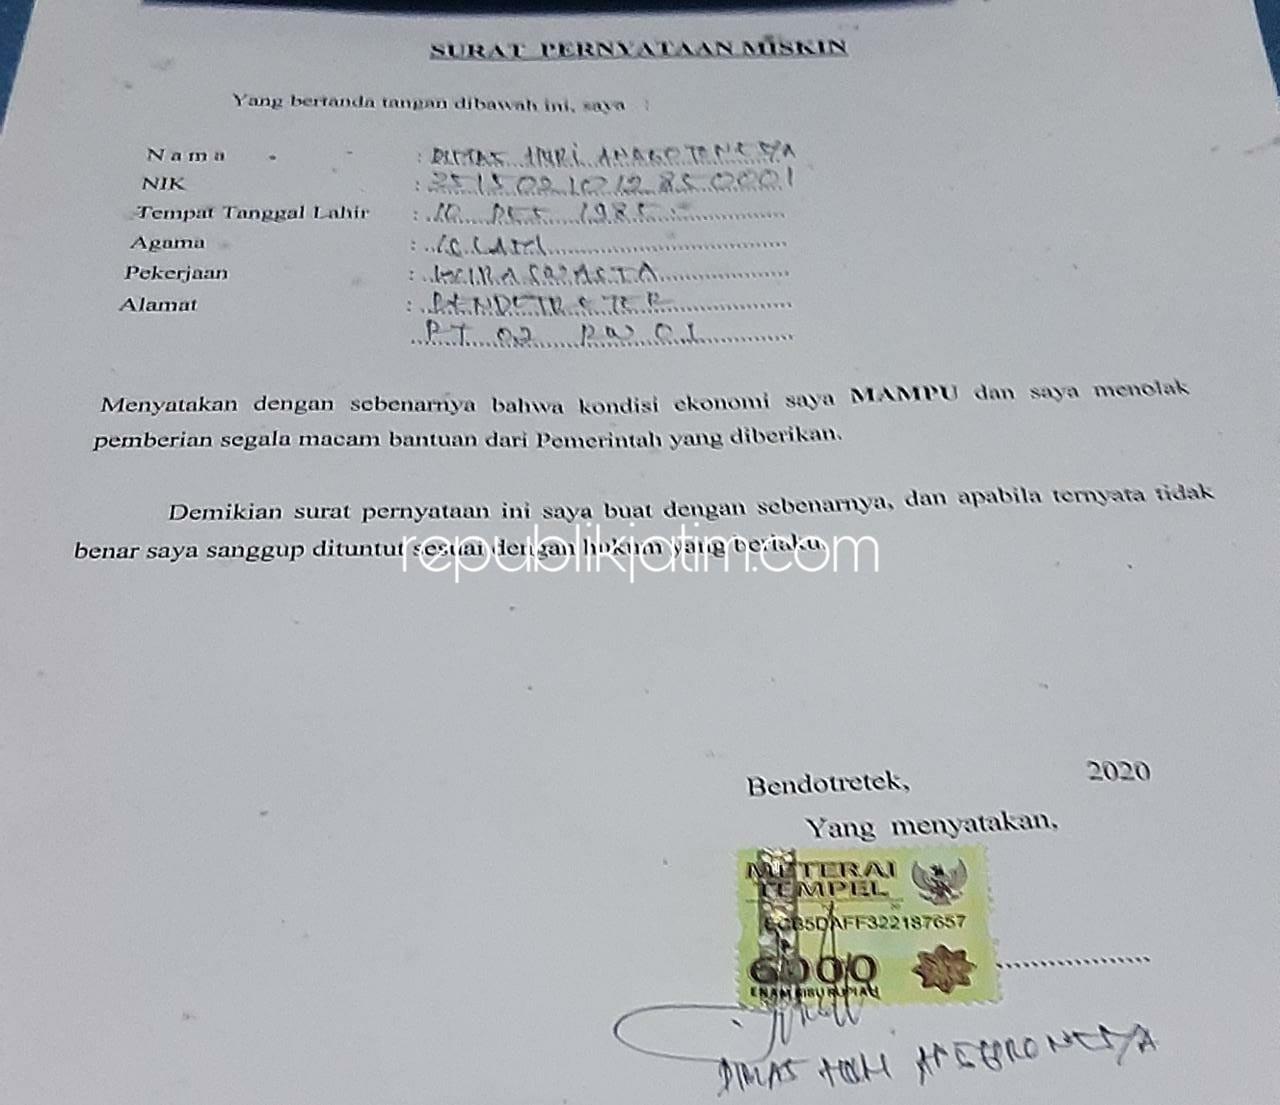 Kepala Desa Contoh Surat Keterangan Tidak Mampu Dari Rt ...